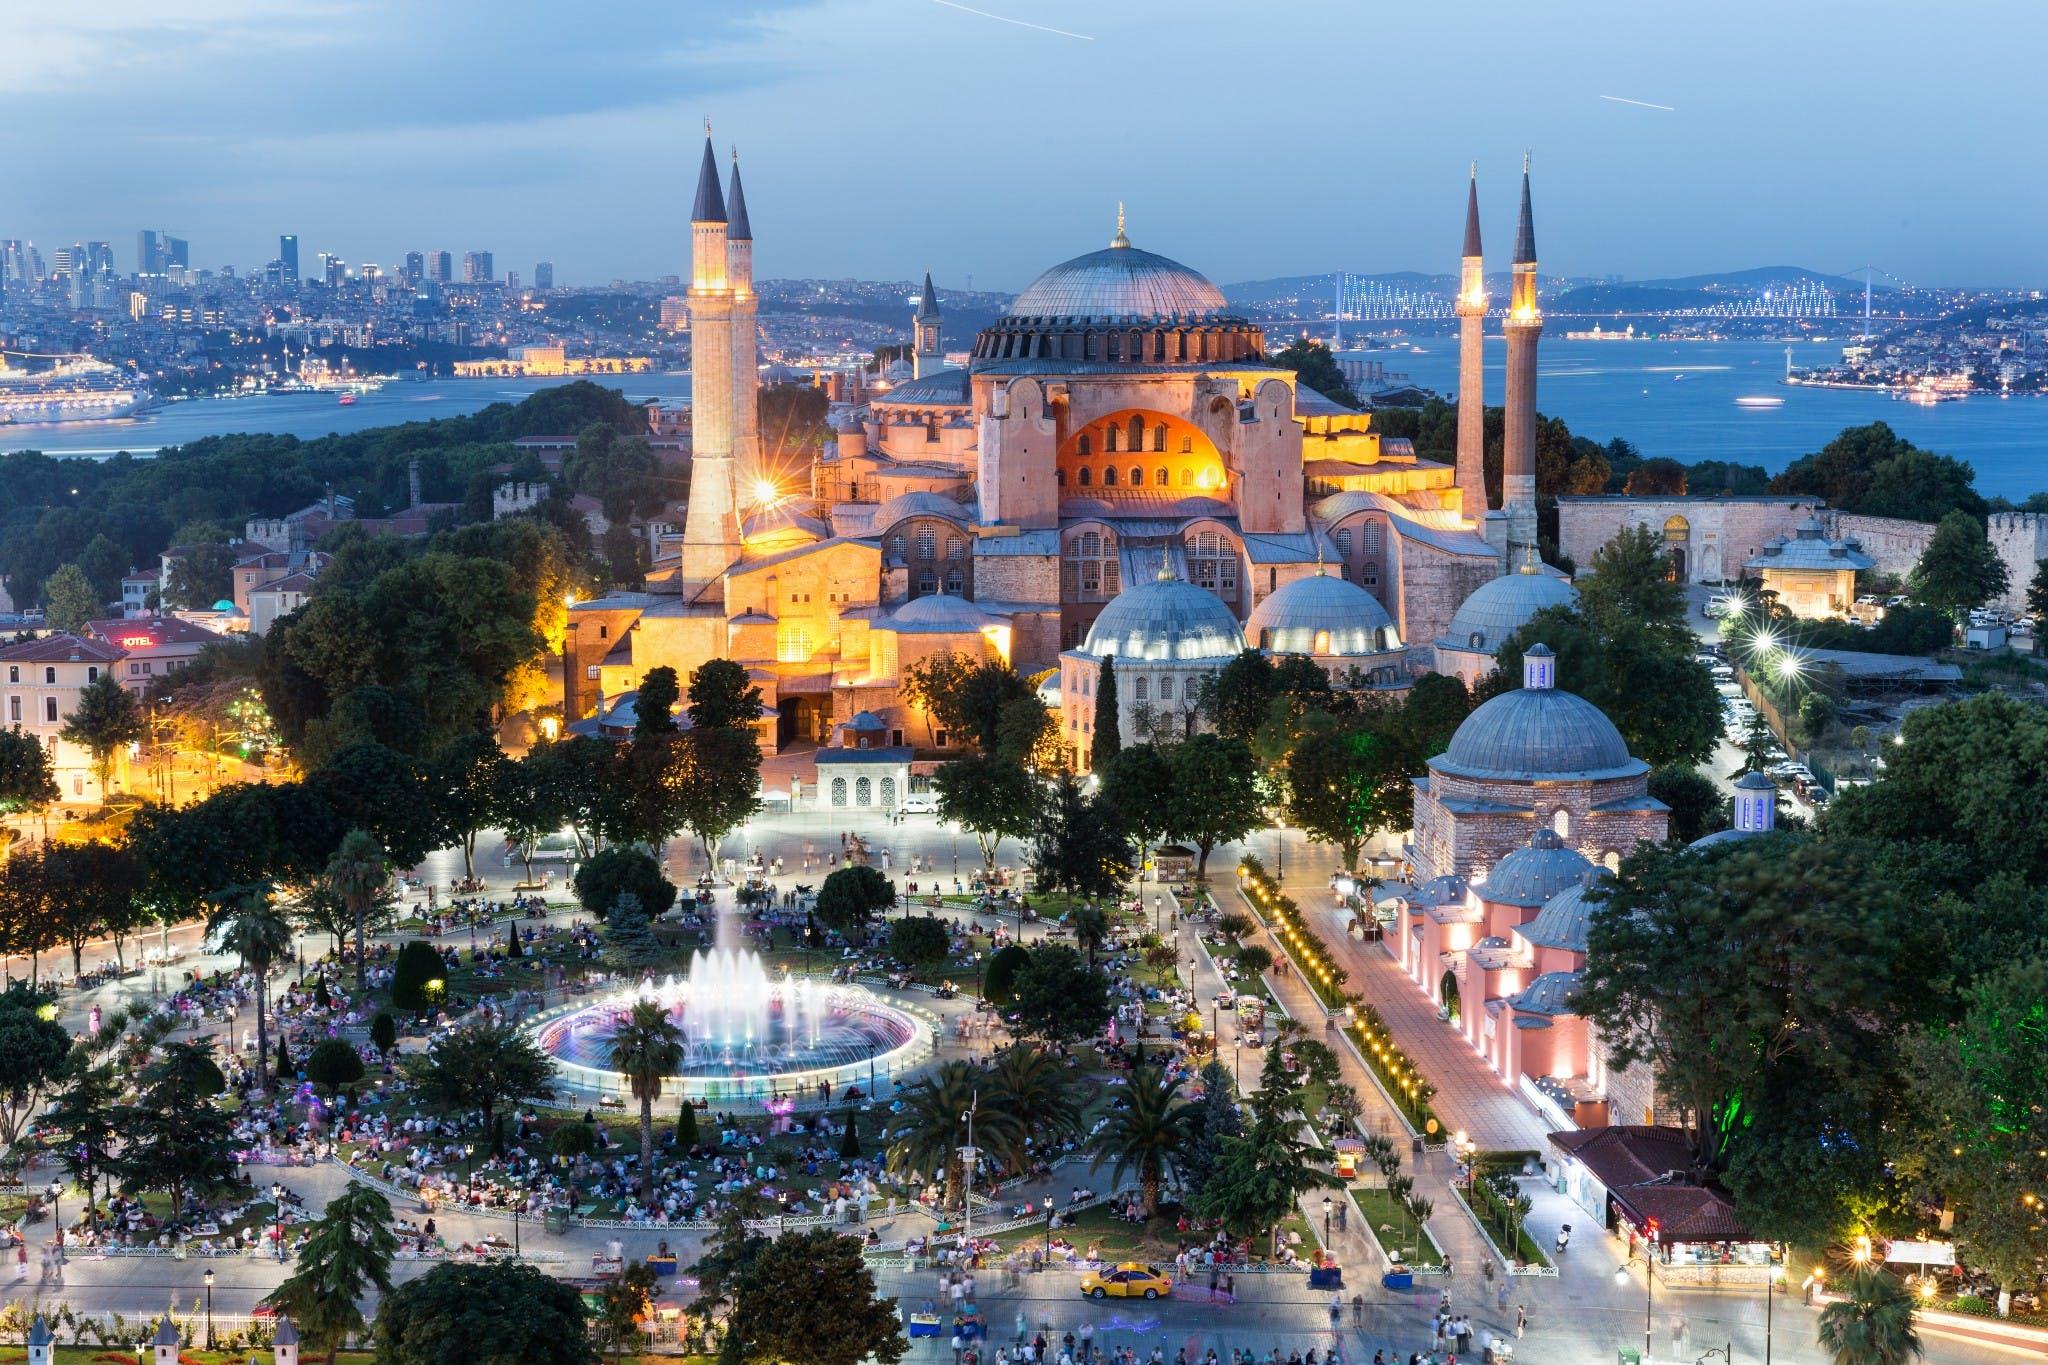 Turquia guia completo ci interc mbio e viagem for Al majed hotel istanbul